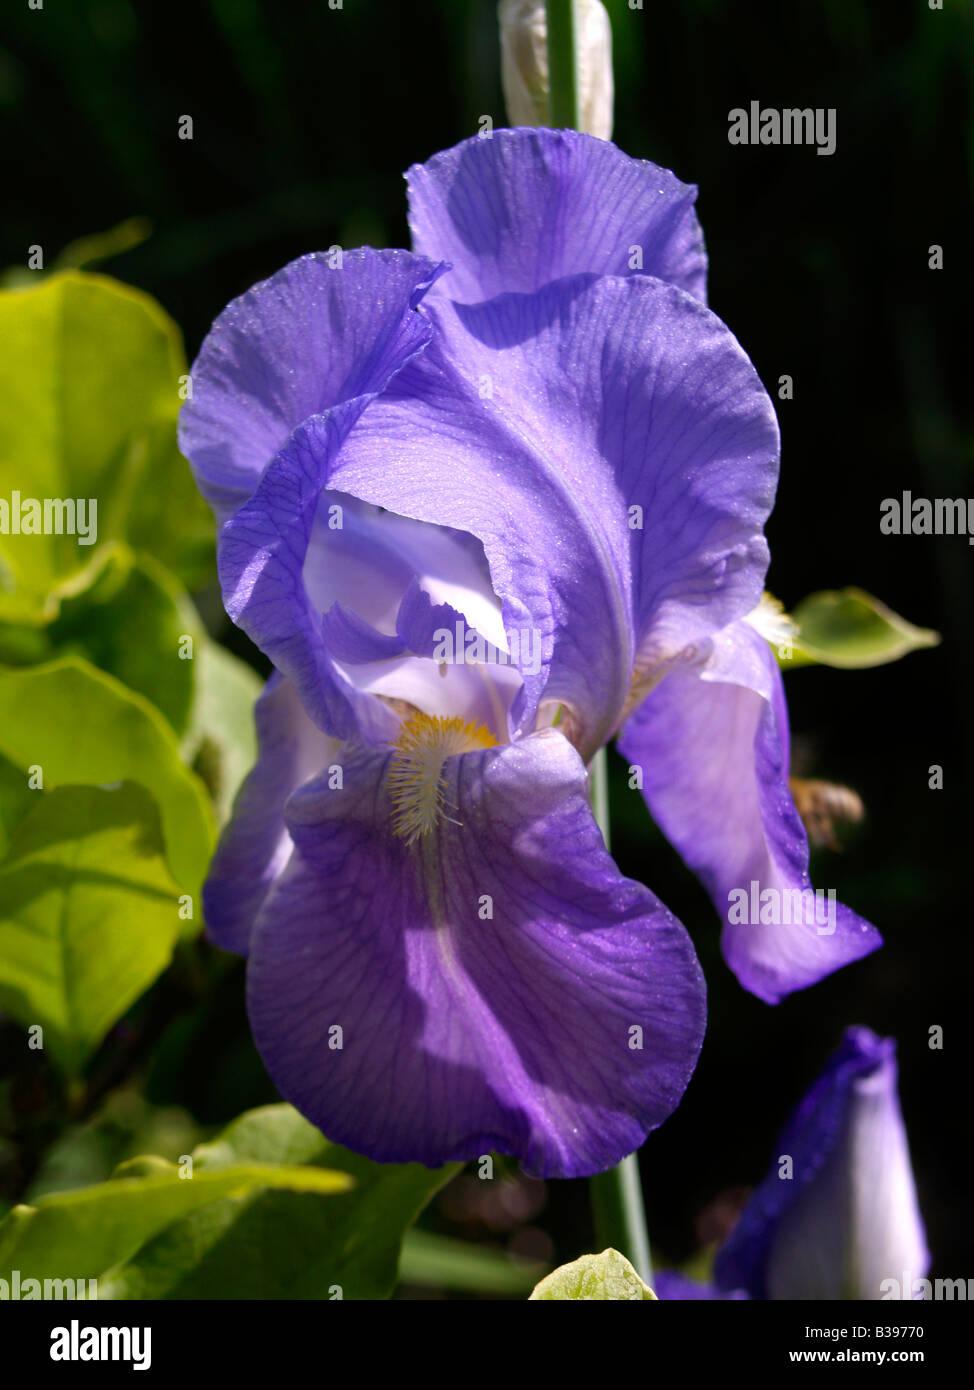 Sibirische schwertlilie iris sibirica siberian iris flower stock sibirische schwertlilie iris sibirica siberian iris flower izmirmasajfo